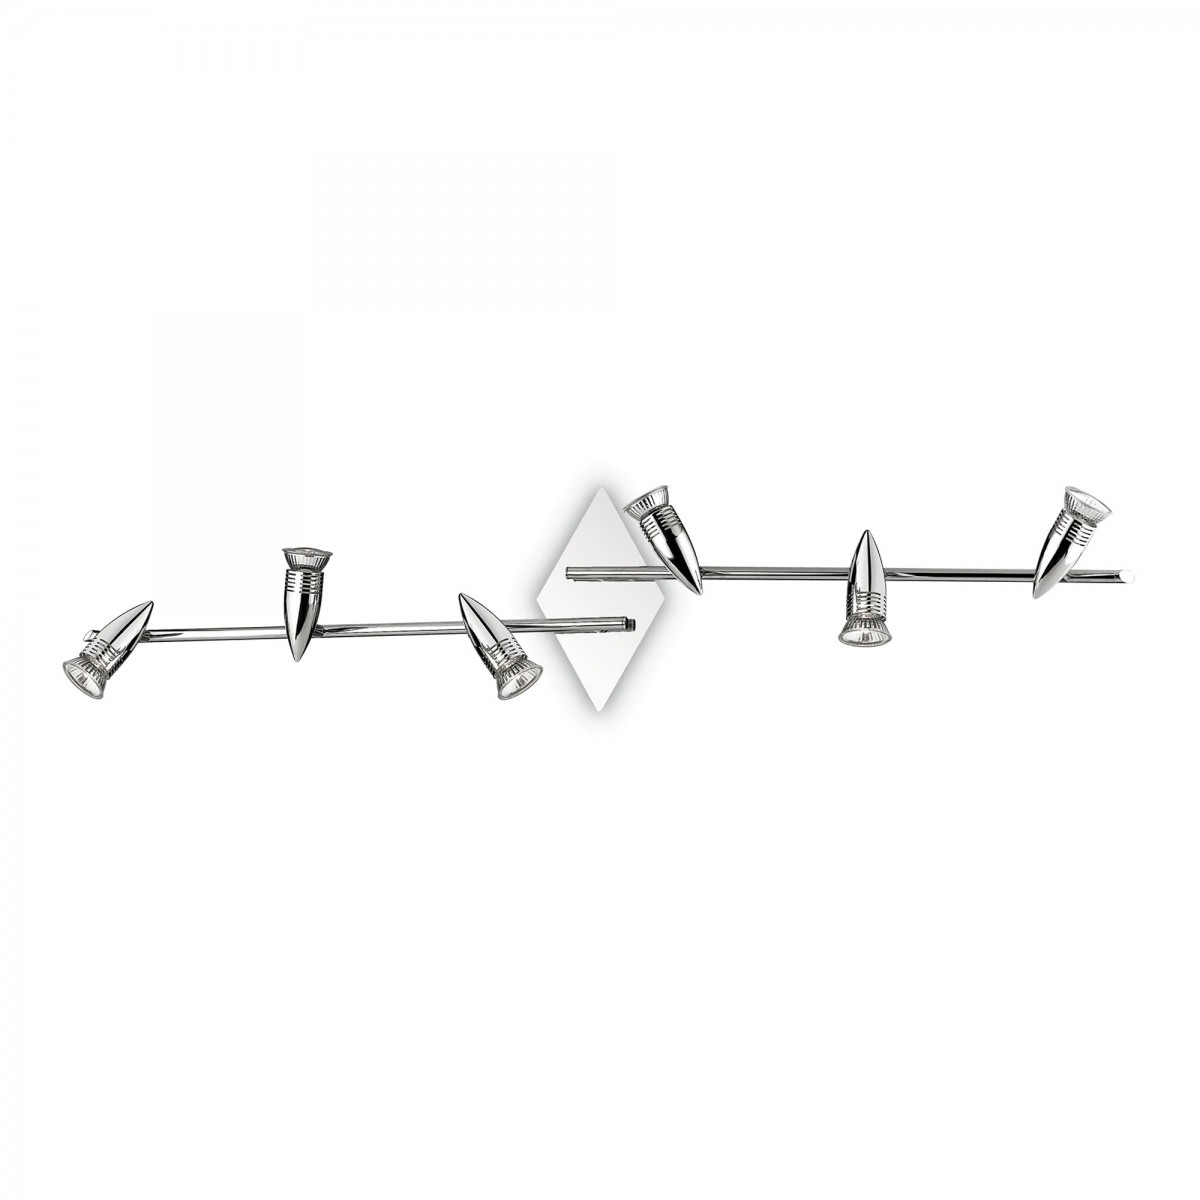 stropní svítidlo Ideal lux Alfa PB6 089591 6x50W GU10 - chrom